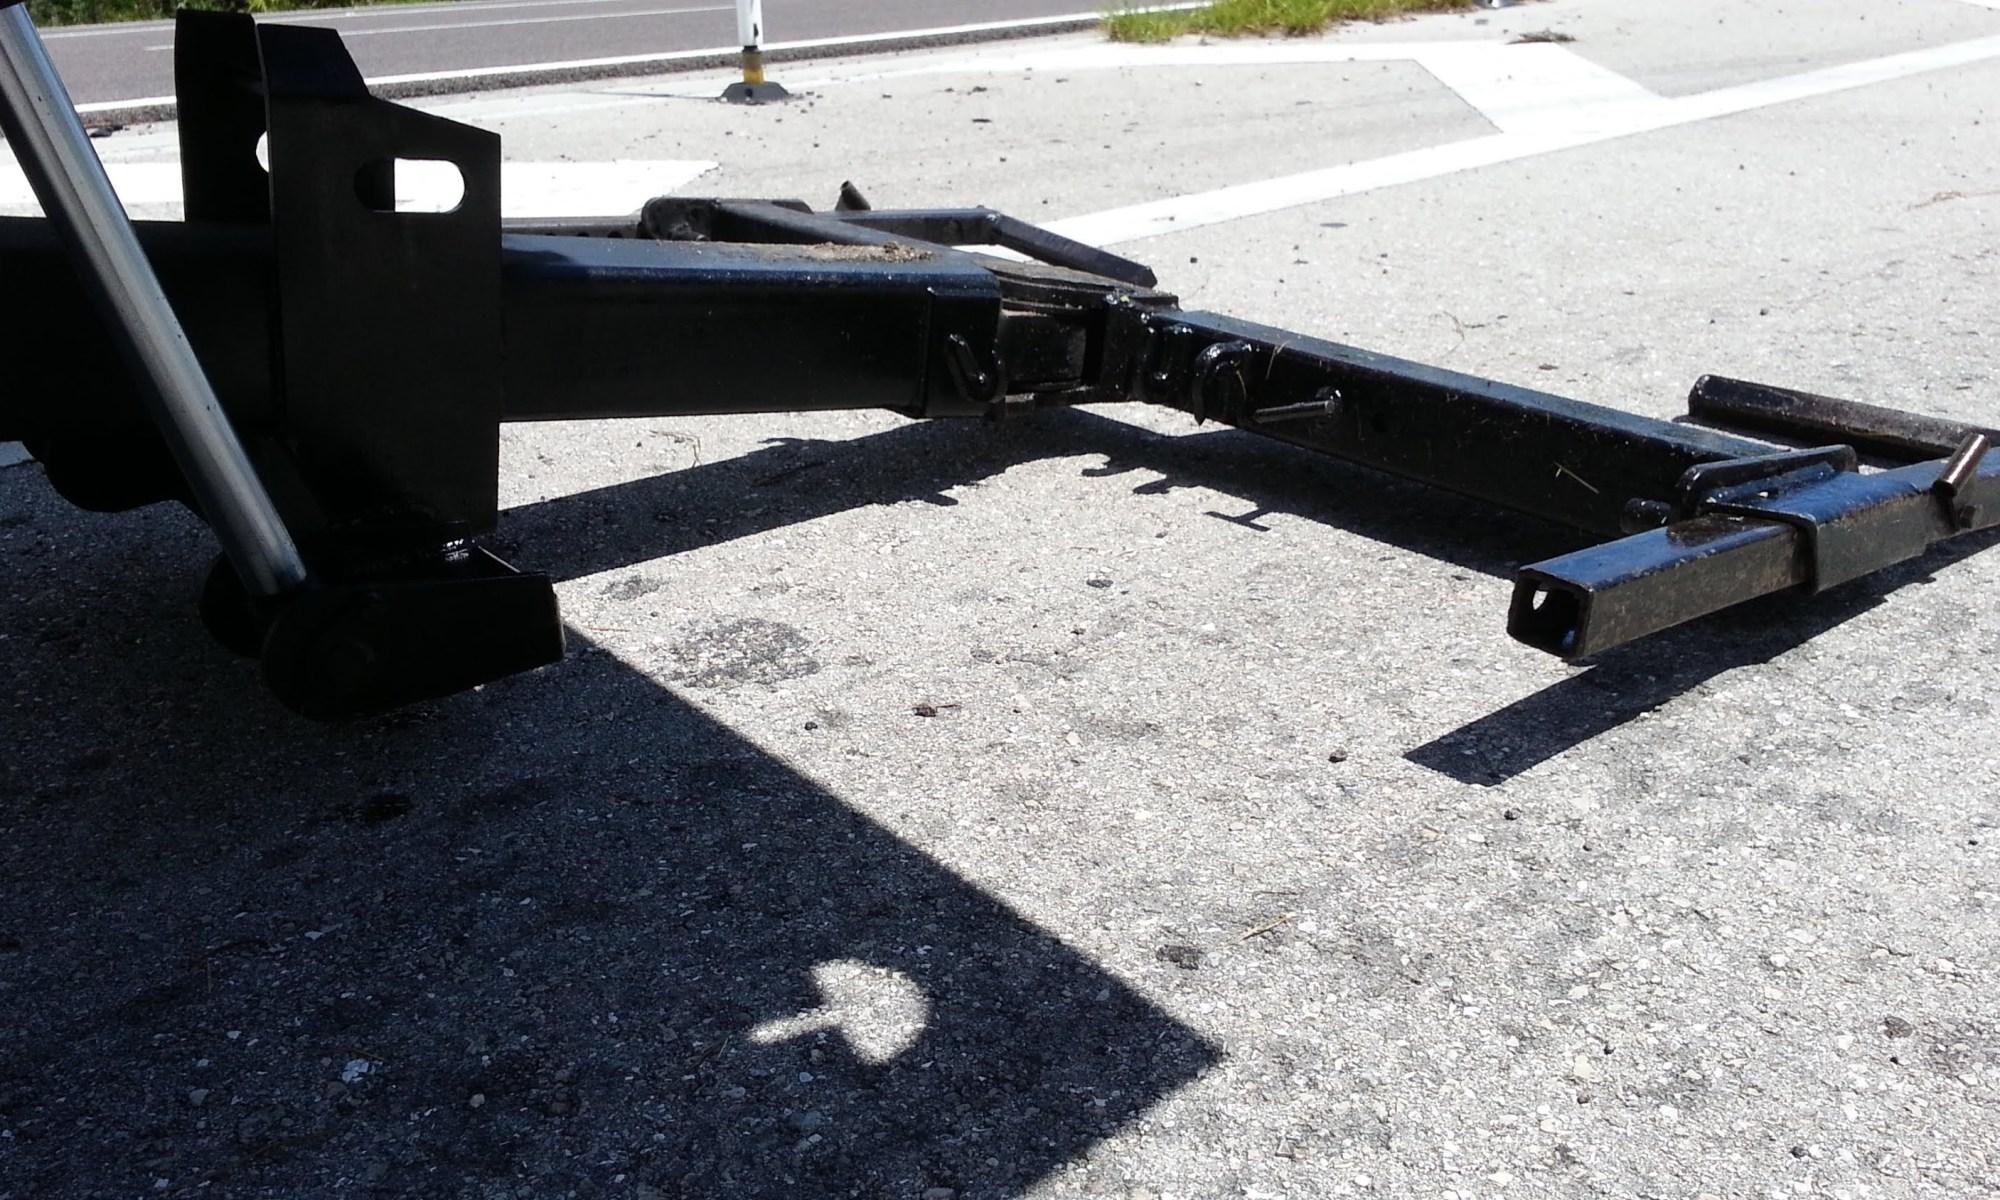 Tow truck Hydraulic cylinder Failure